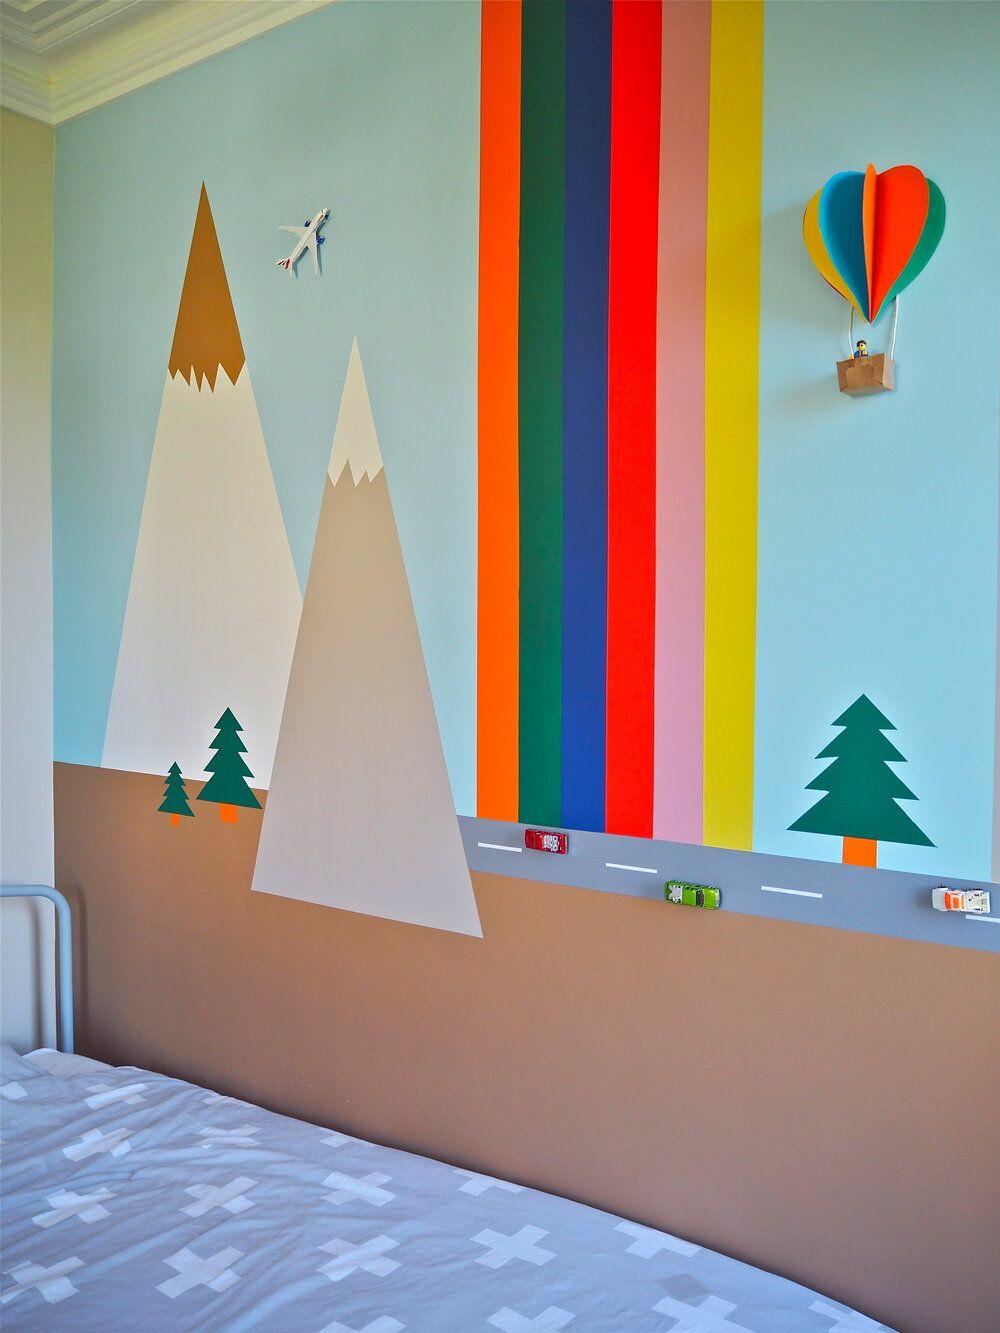 Child S Bedroom 3d Wall Mural Diy In 2020 Wall Murals Diy Kids Wall Murals Murals For Kids